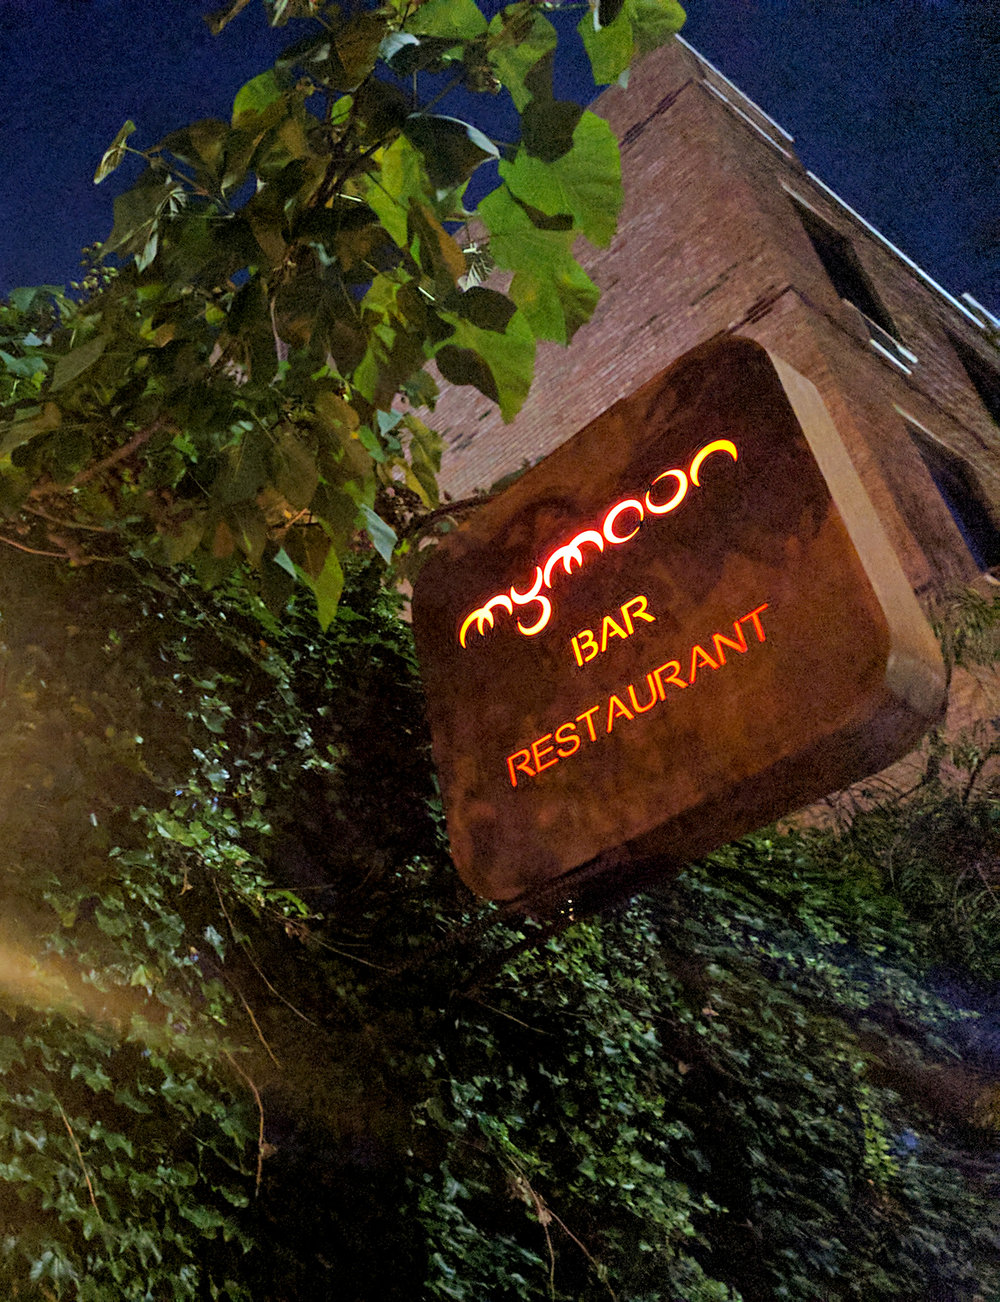 My Moon restaurant sign